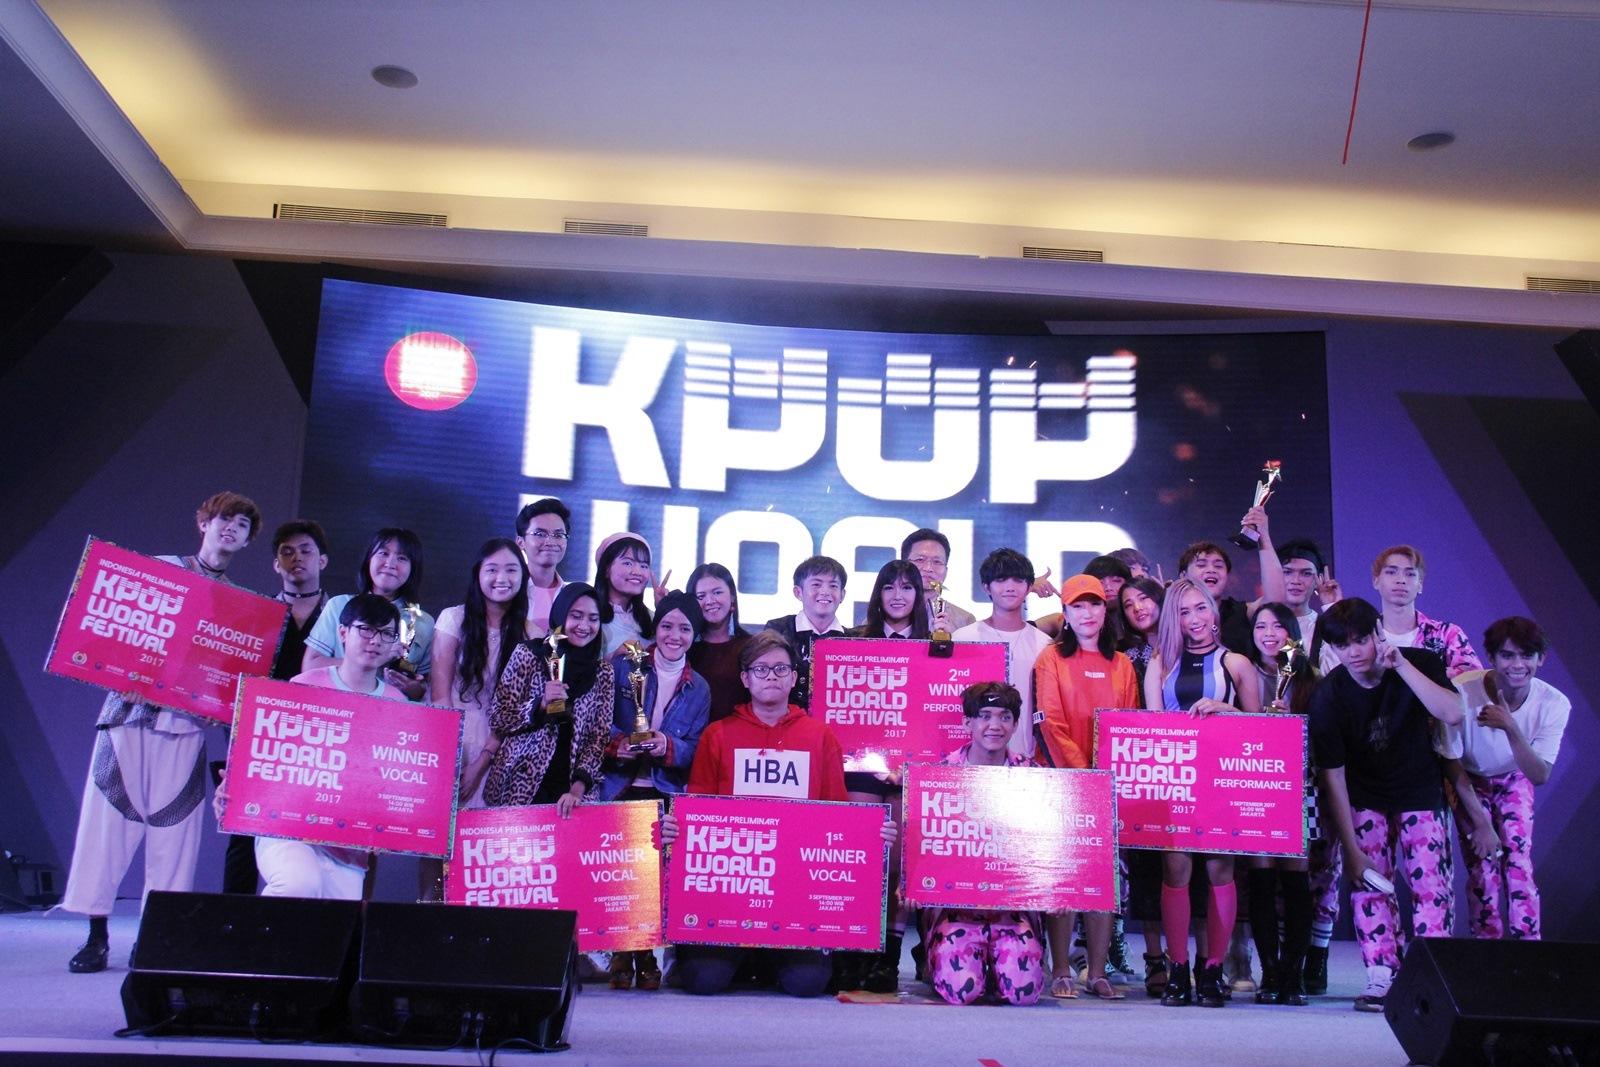 k-pop-world-festival-2017-indonesia_kcc-01